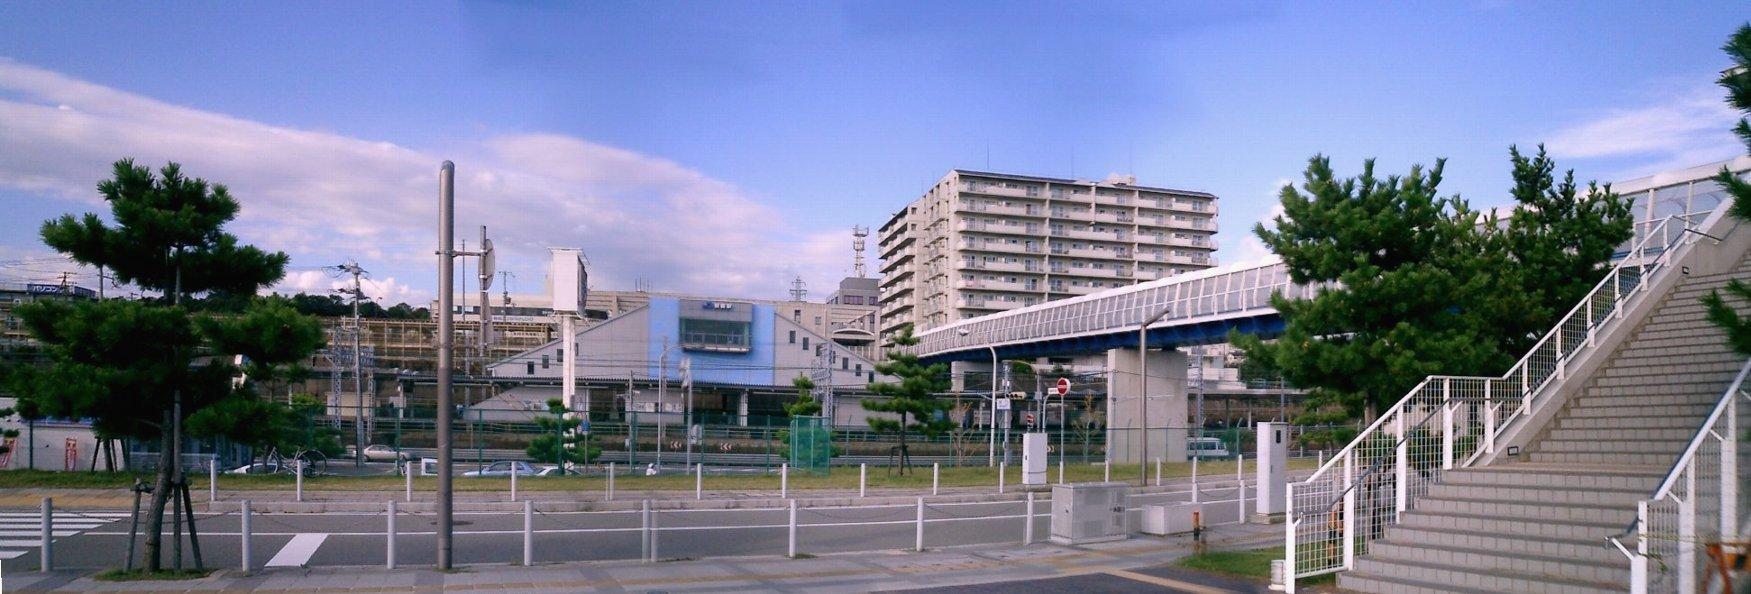 file asagirieki jpg wikimedia commons